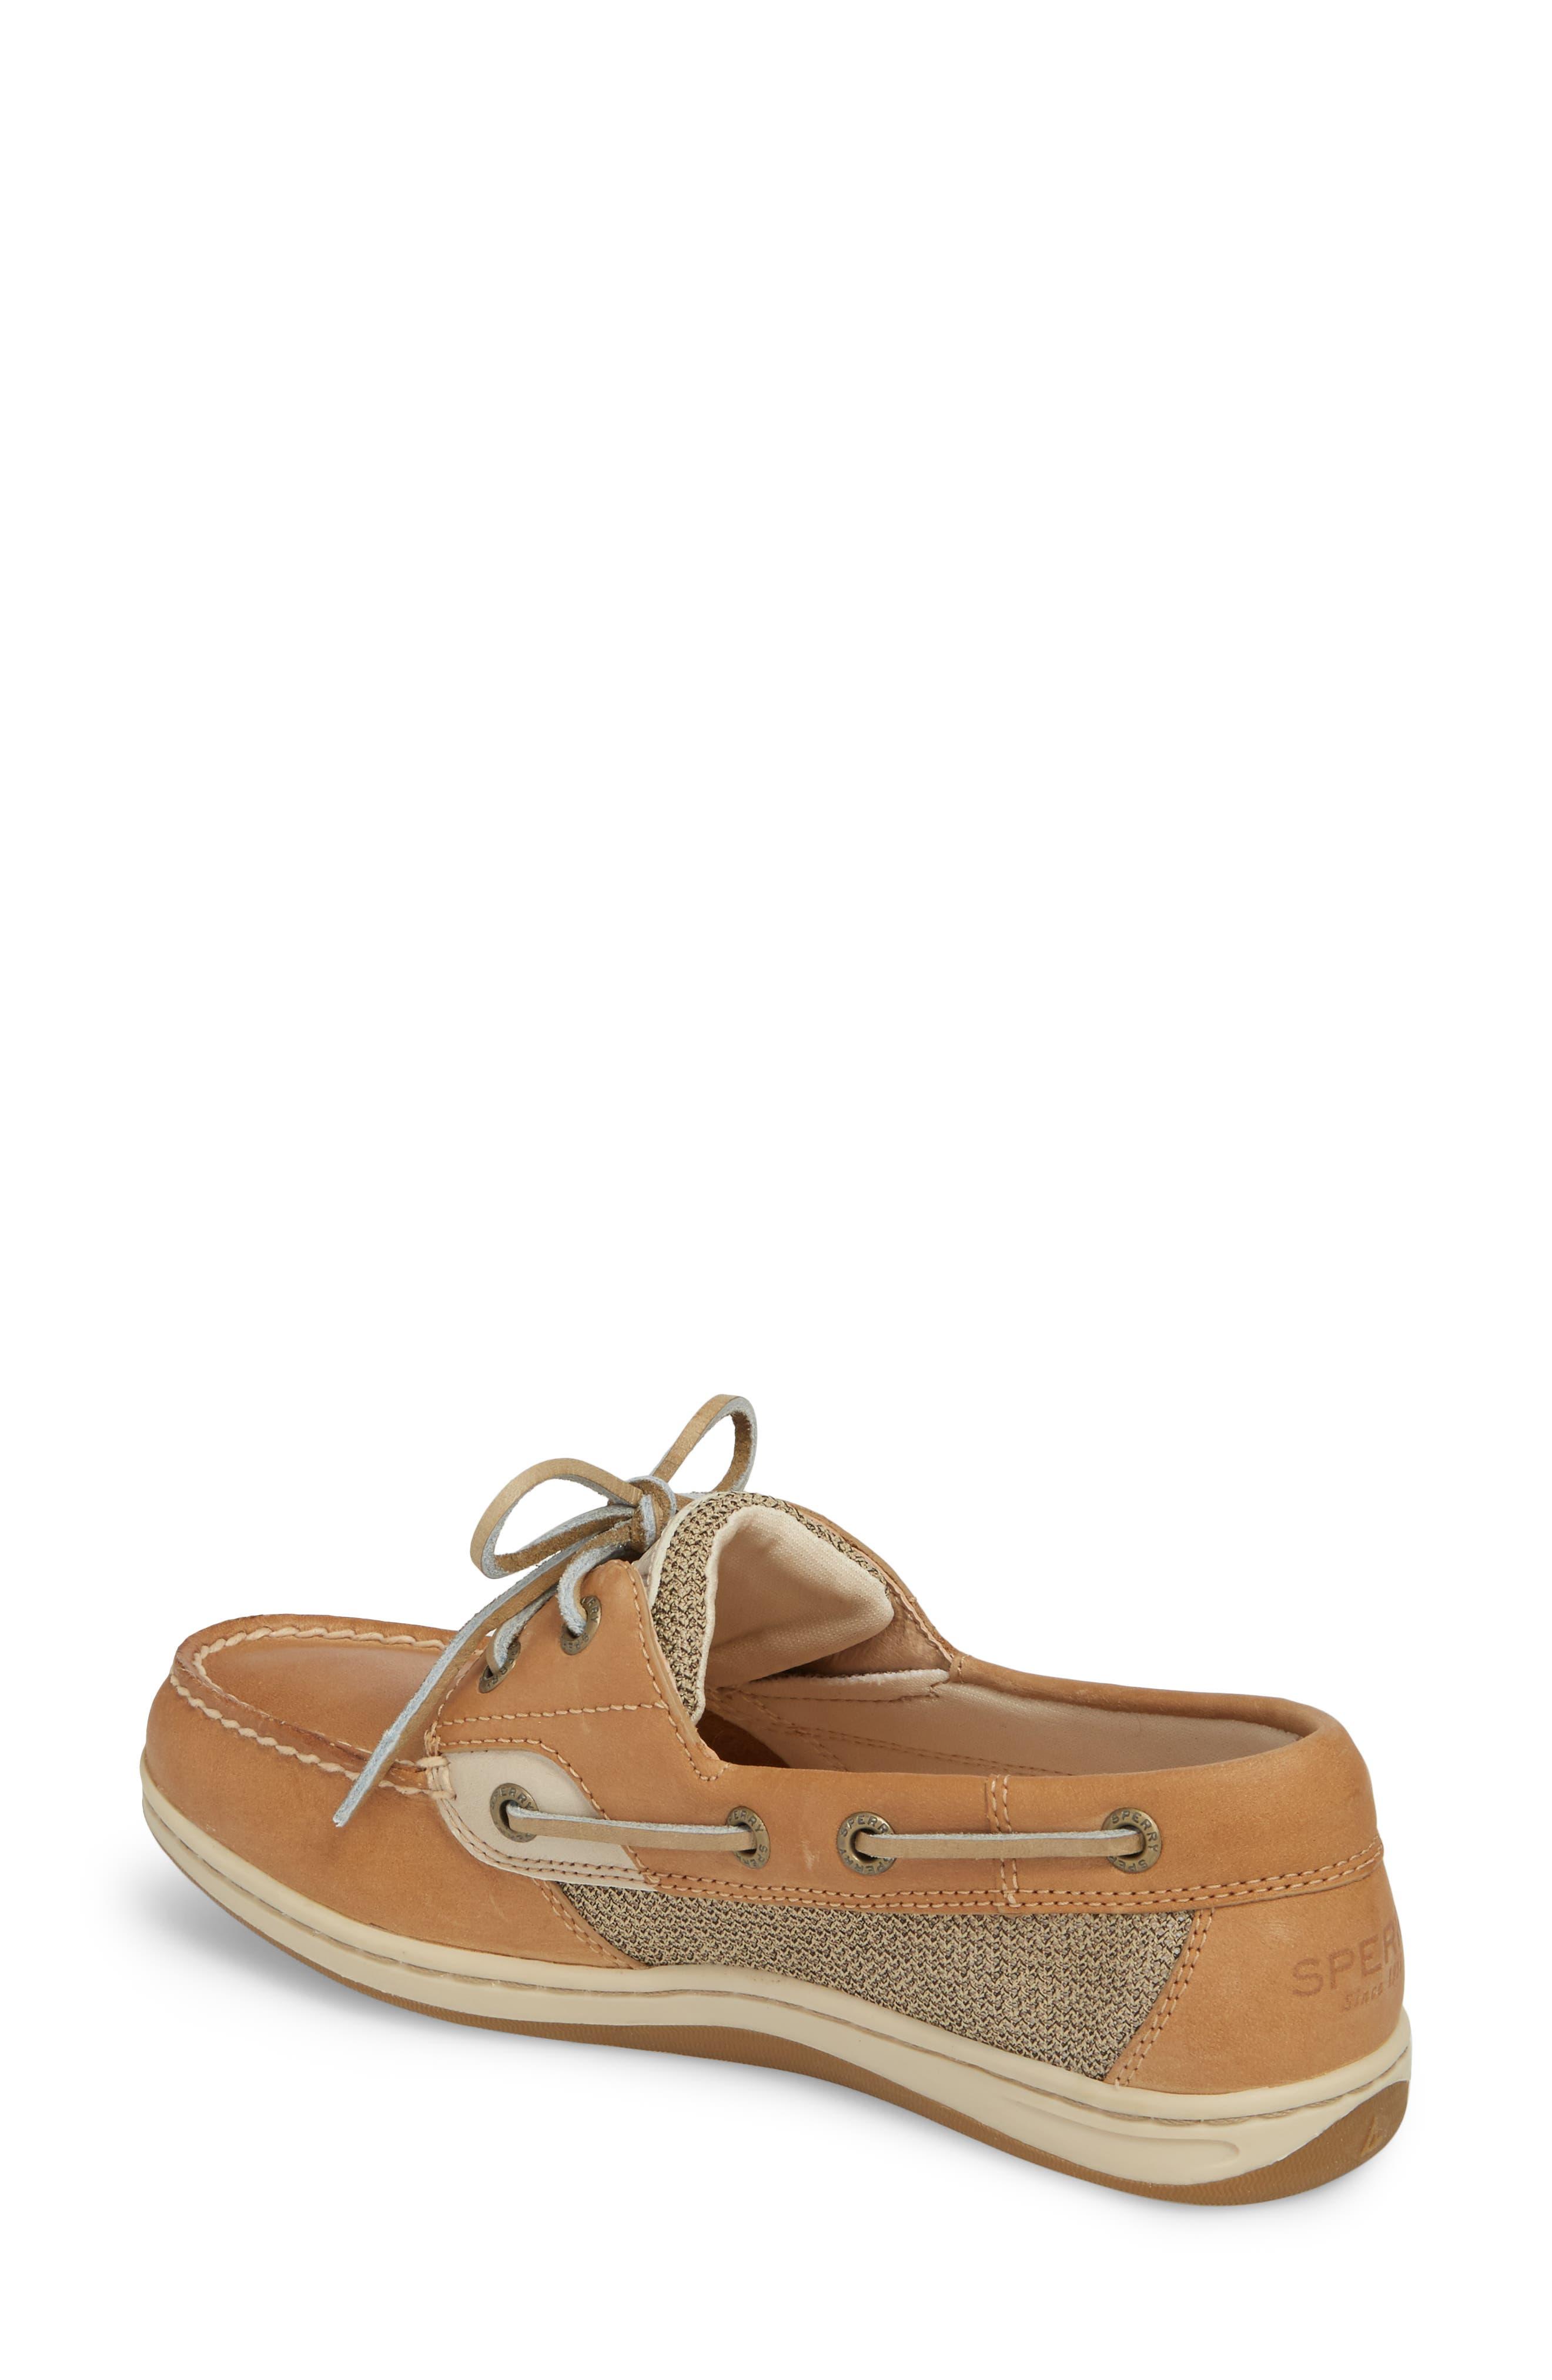 Top-Sider Koifish Loafer,                             Alternate thumbnail 2, color,                             Linen Oat Leather